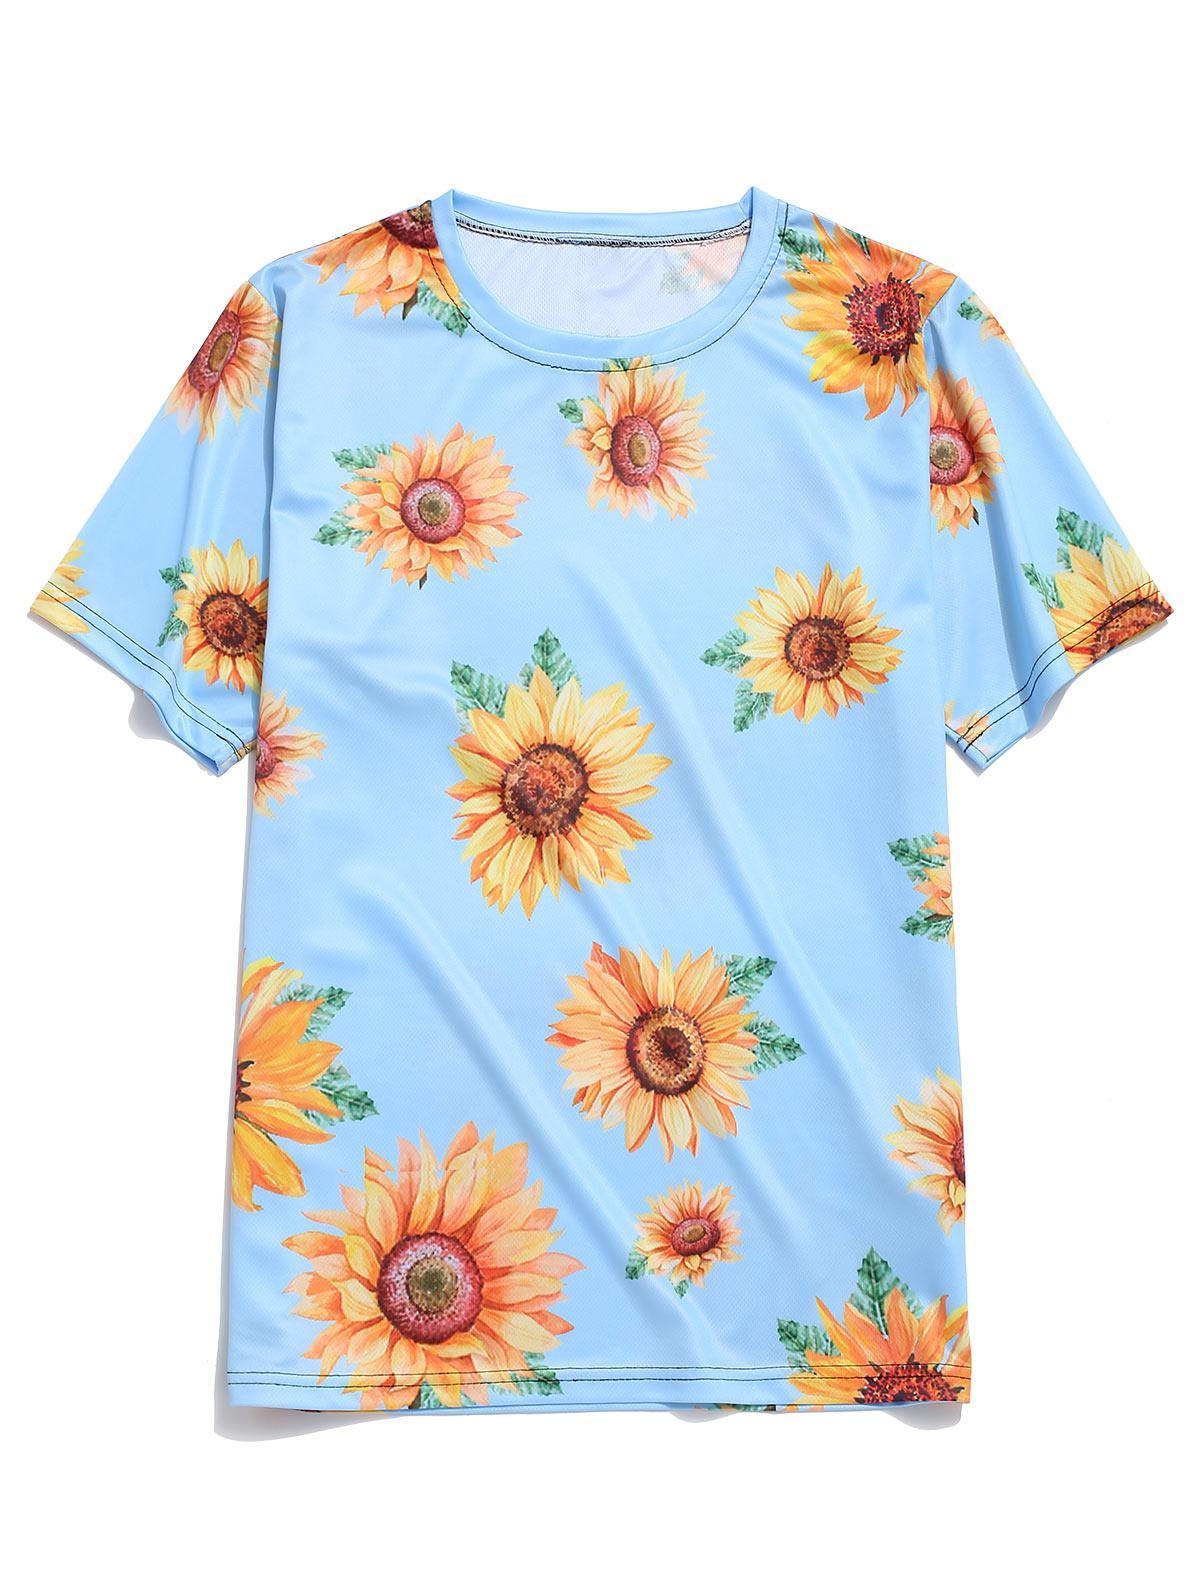 Short Sleeve Sunflower Print Vacation T-shirt фото